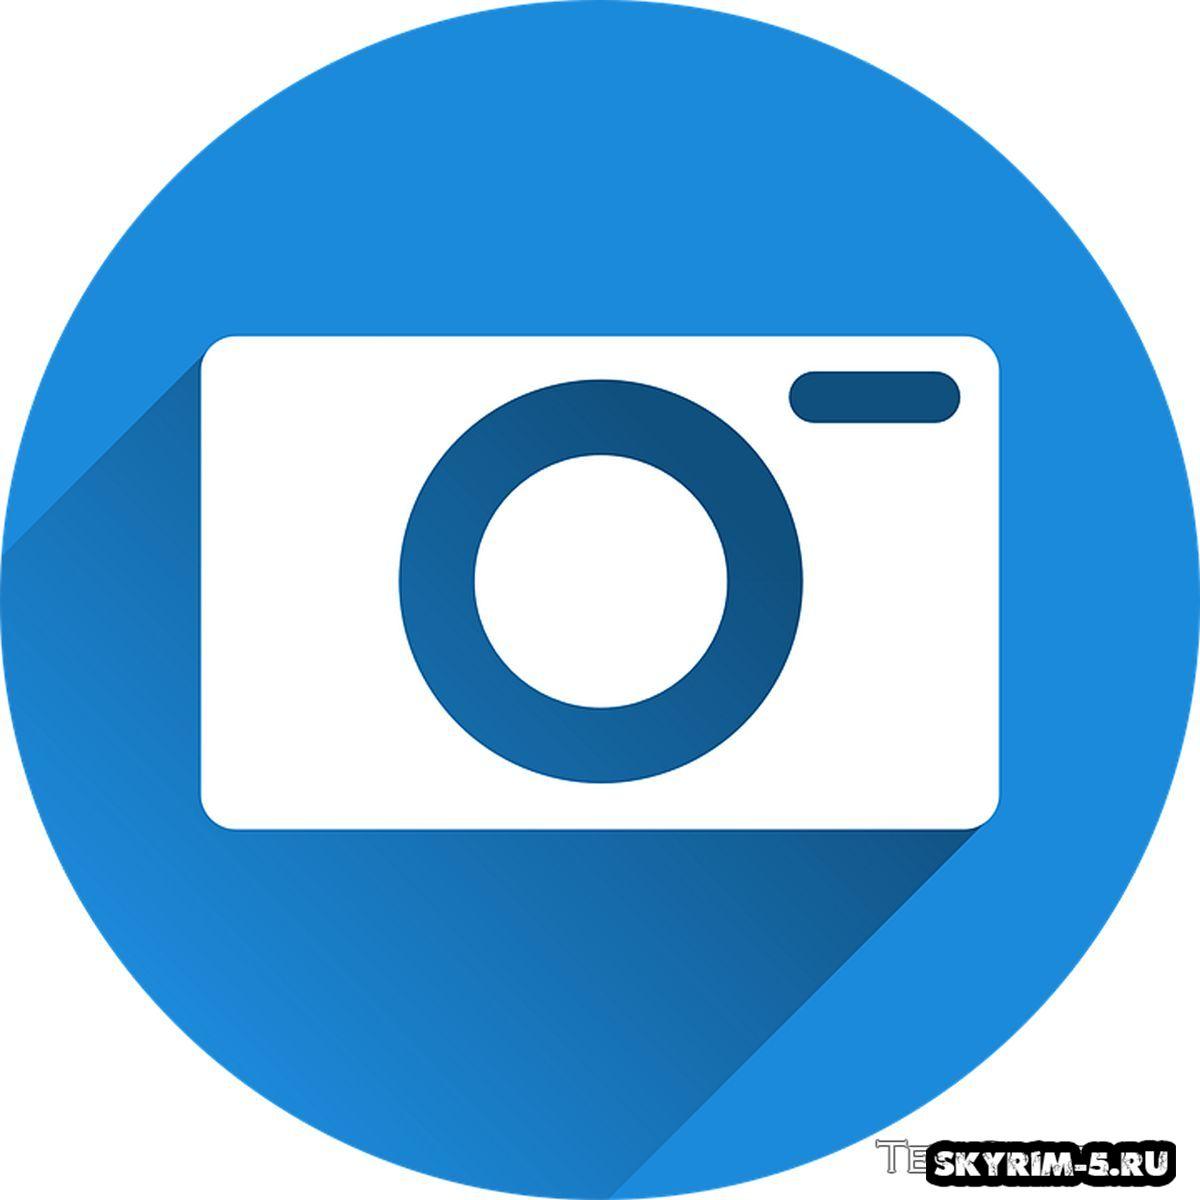 3PCO - Обновление камеры от 3-го лица